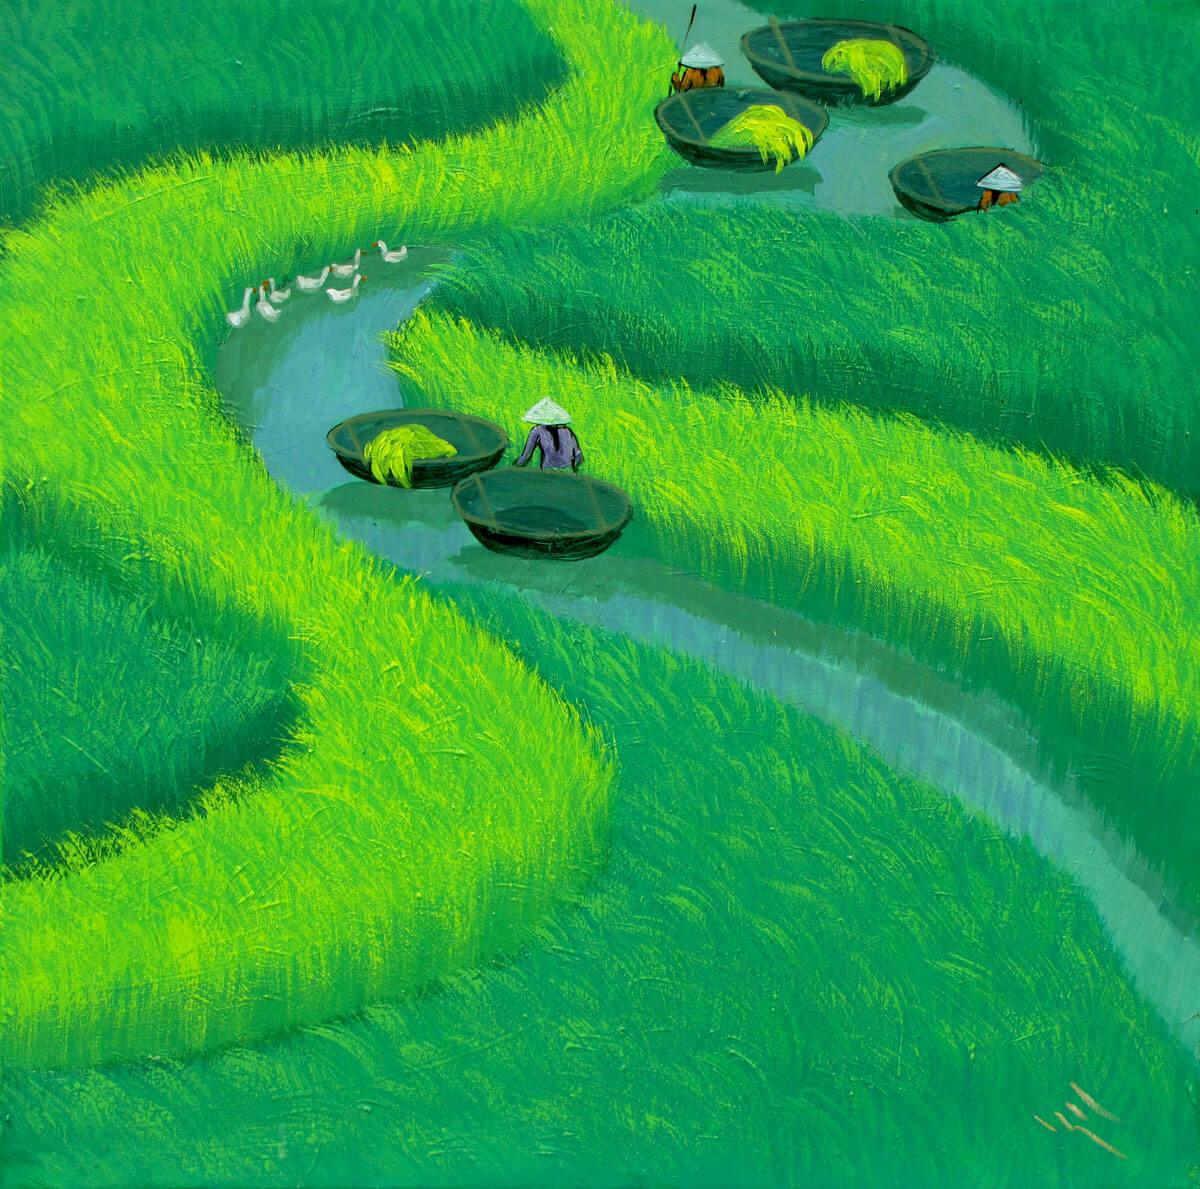 Paddy field 01-Vietnamese Painting